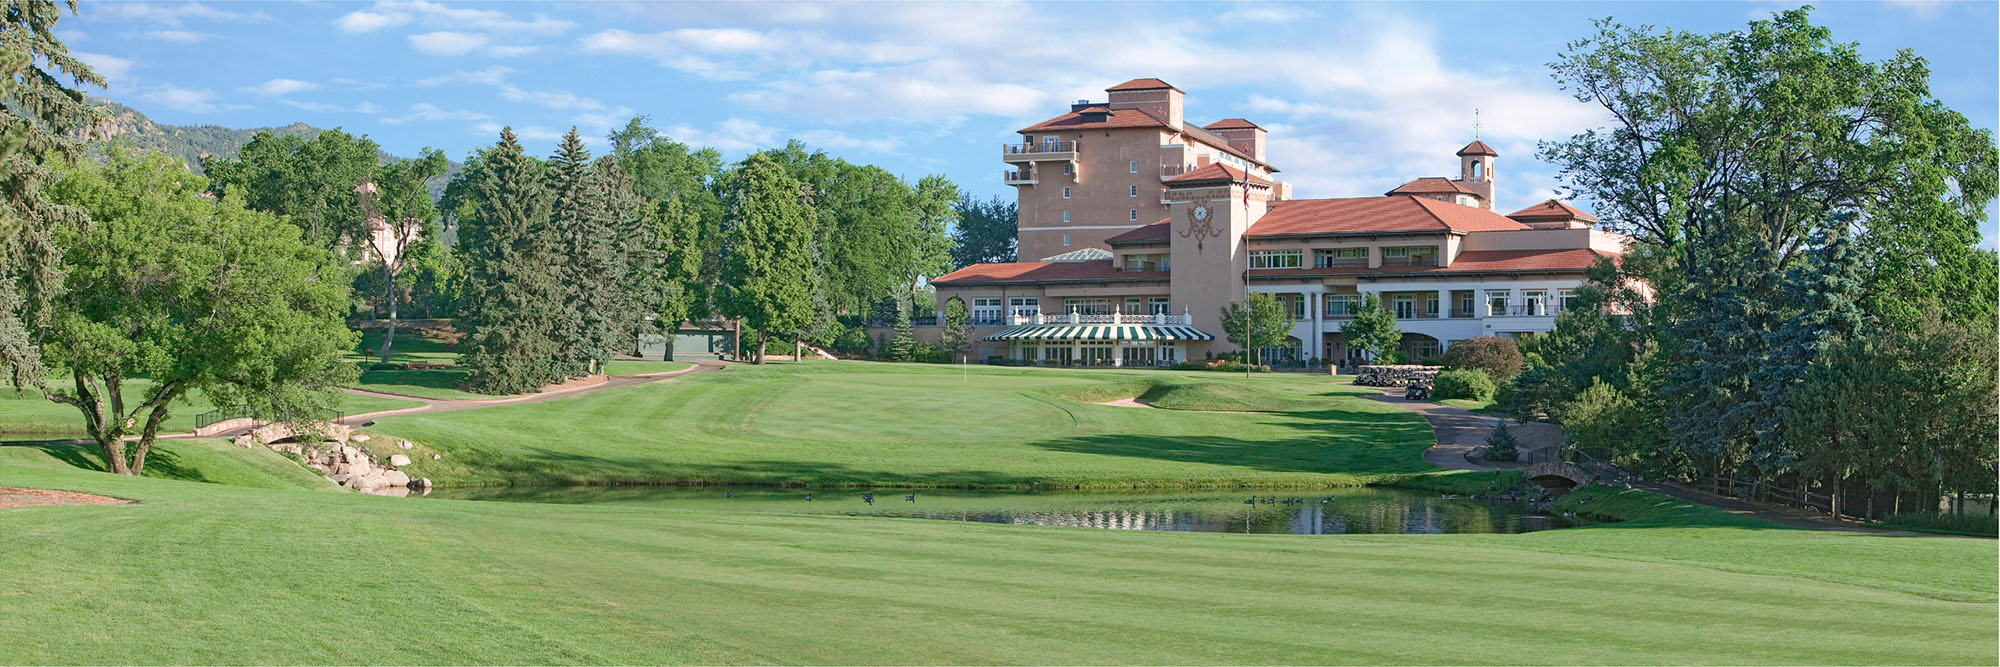 Golf Course Image - Broadmoor East No. 18